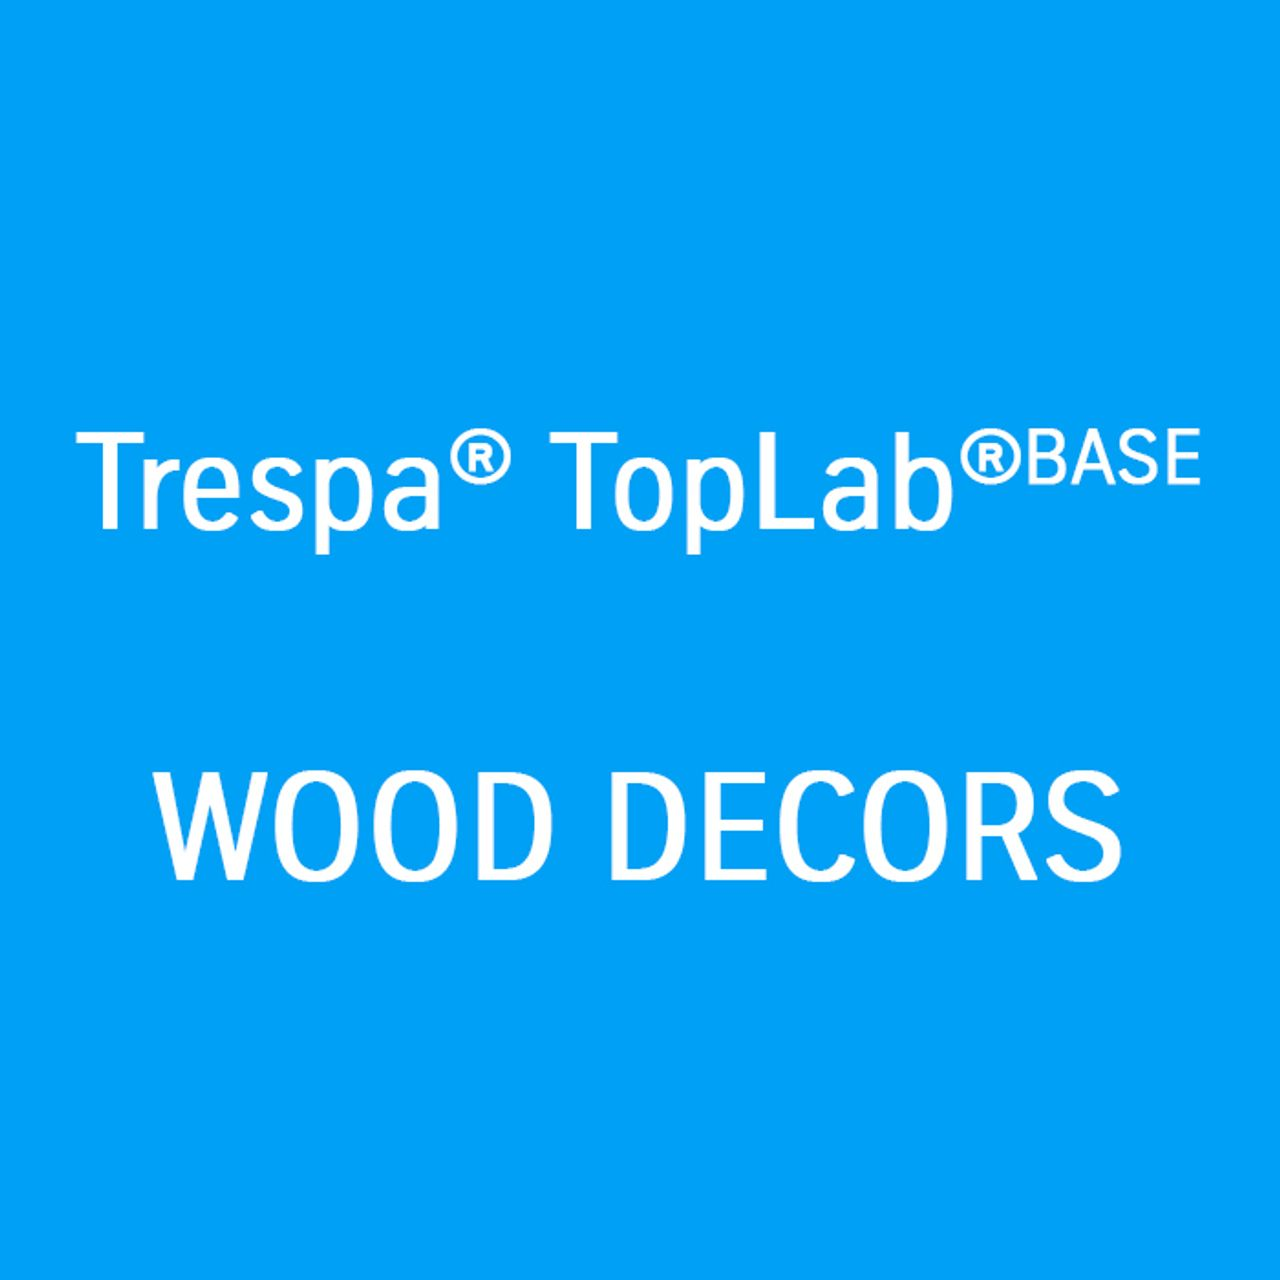 Trespa Top Lab Base Wood Decors